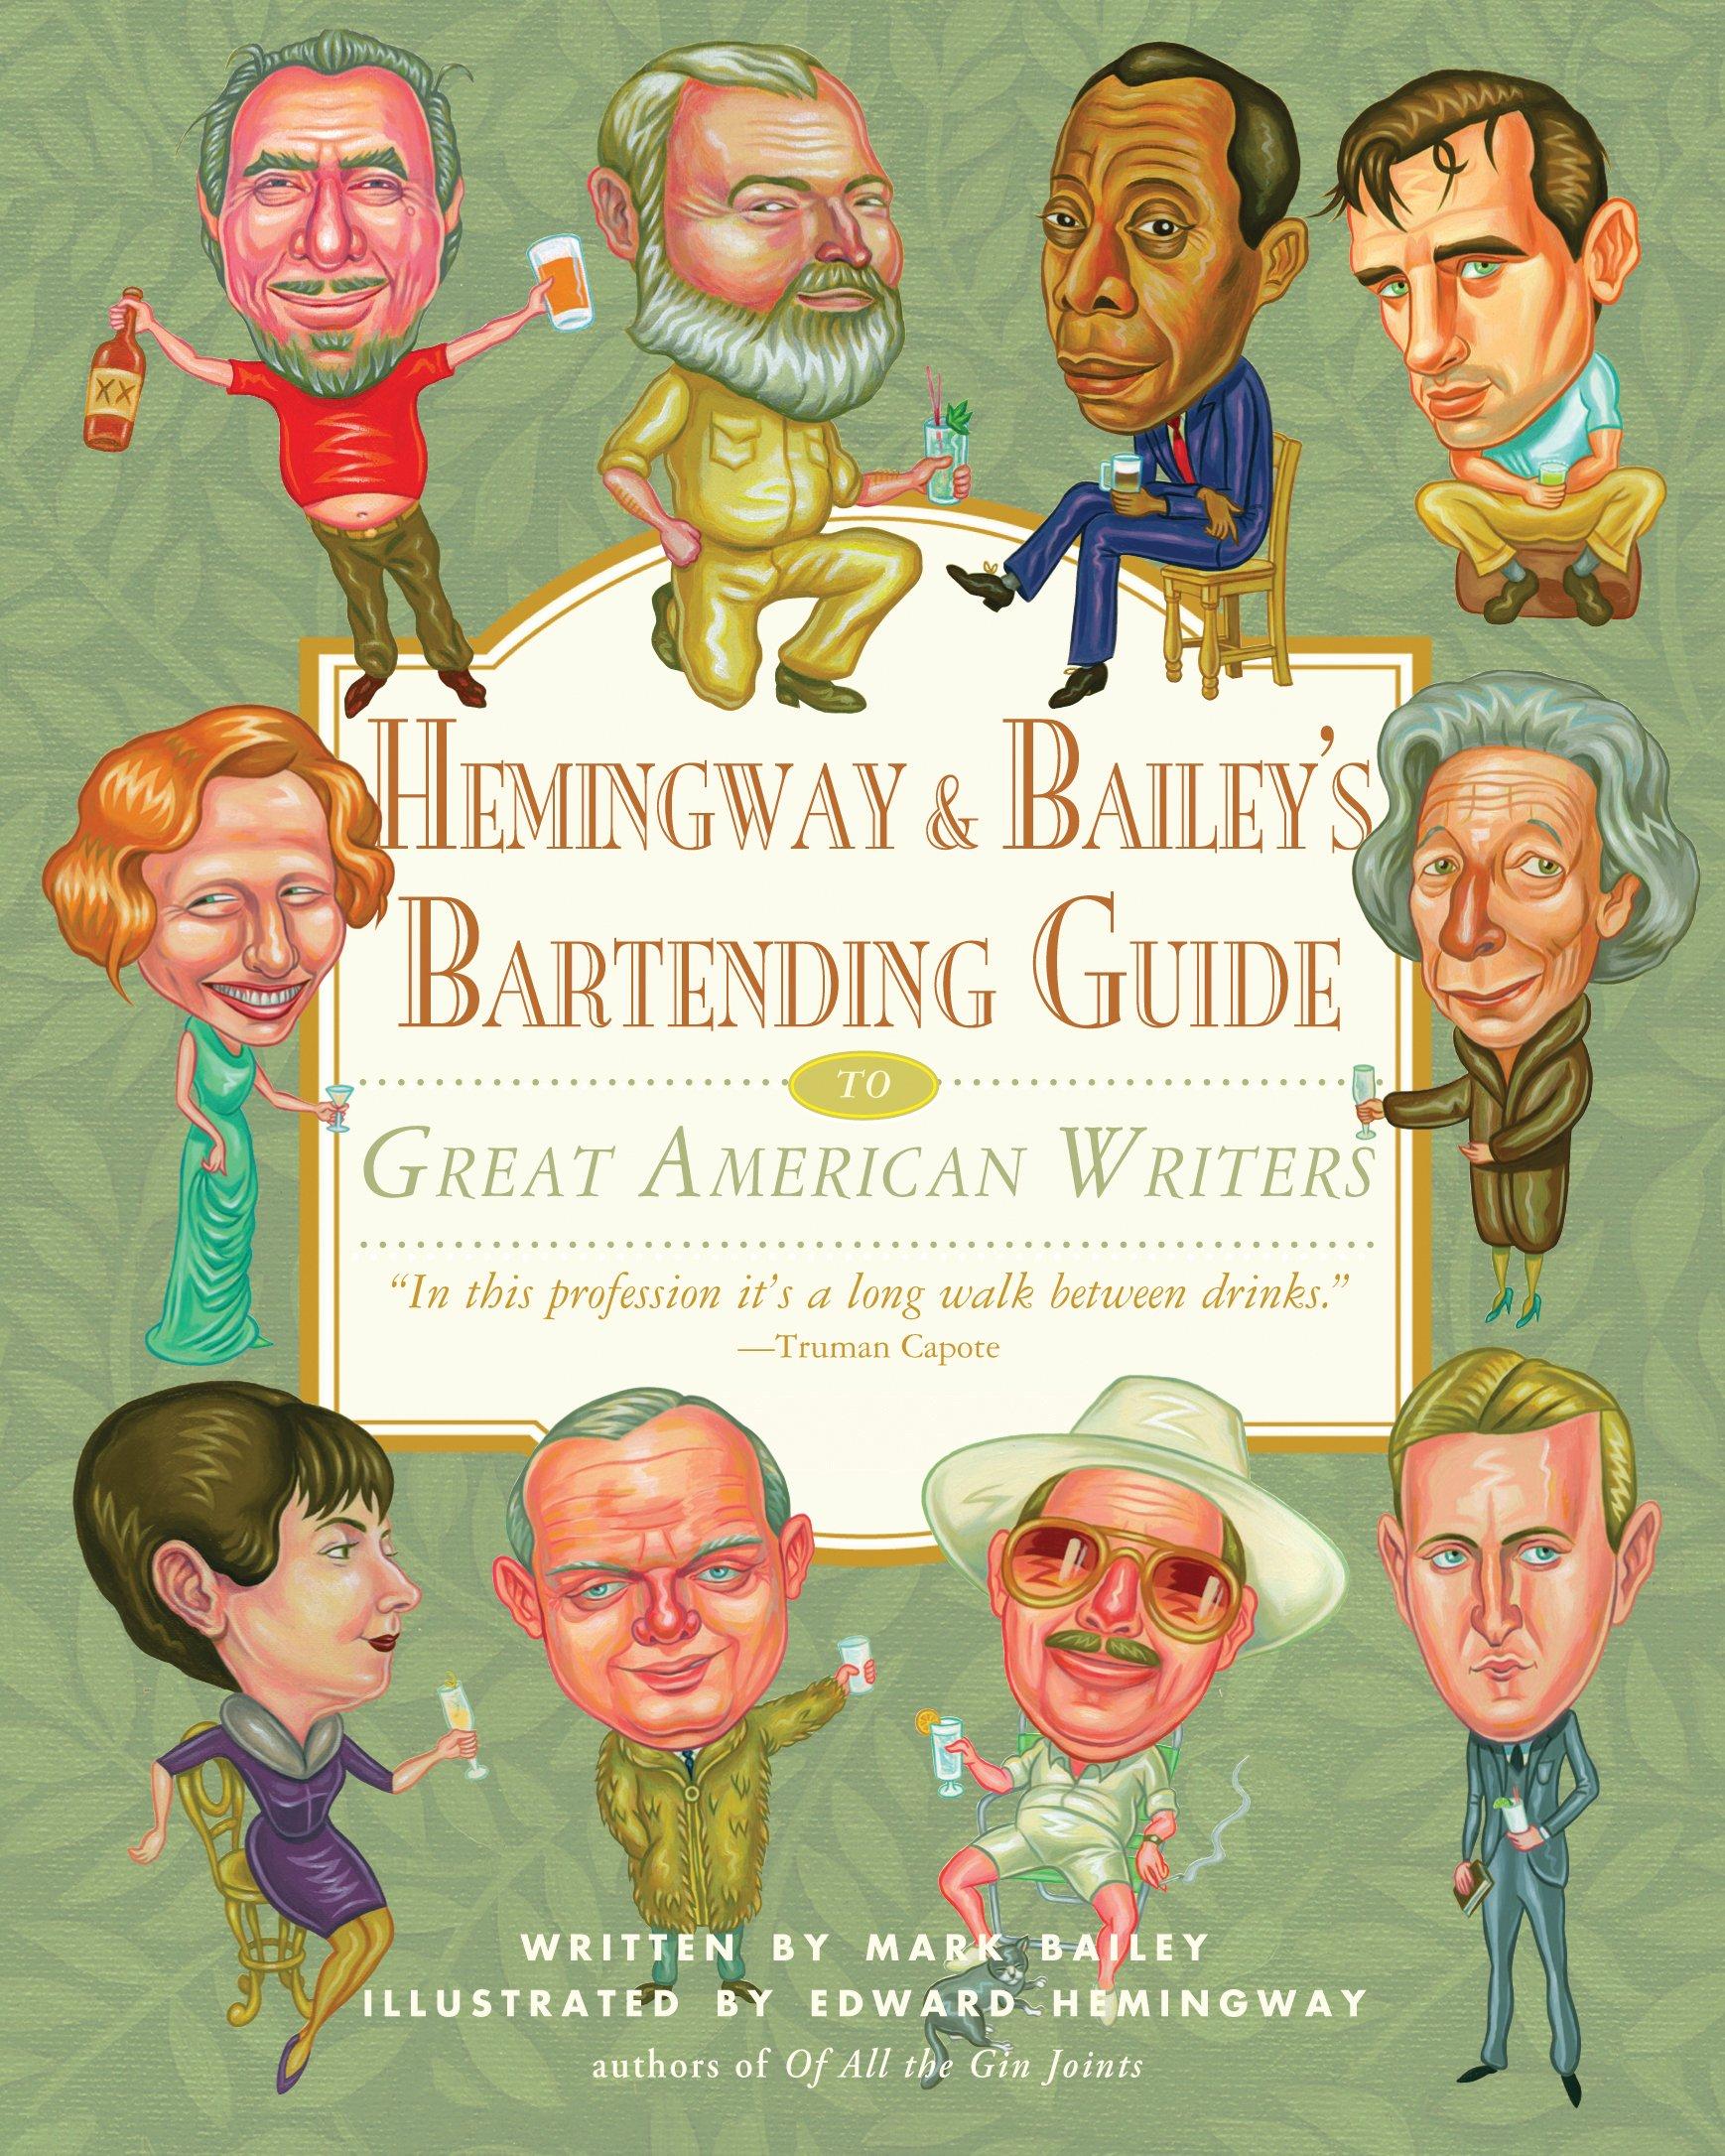 Hemingway & Bailey's Bartending Guide to Great American